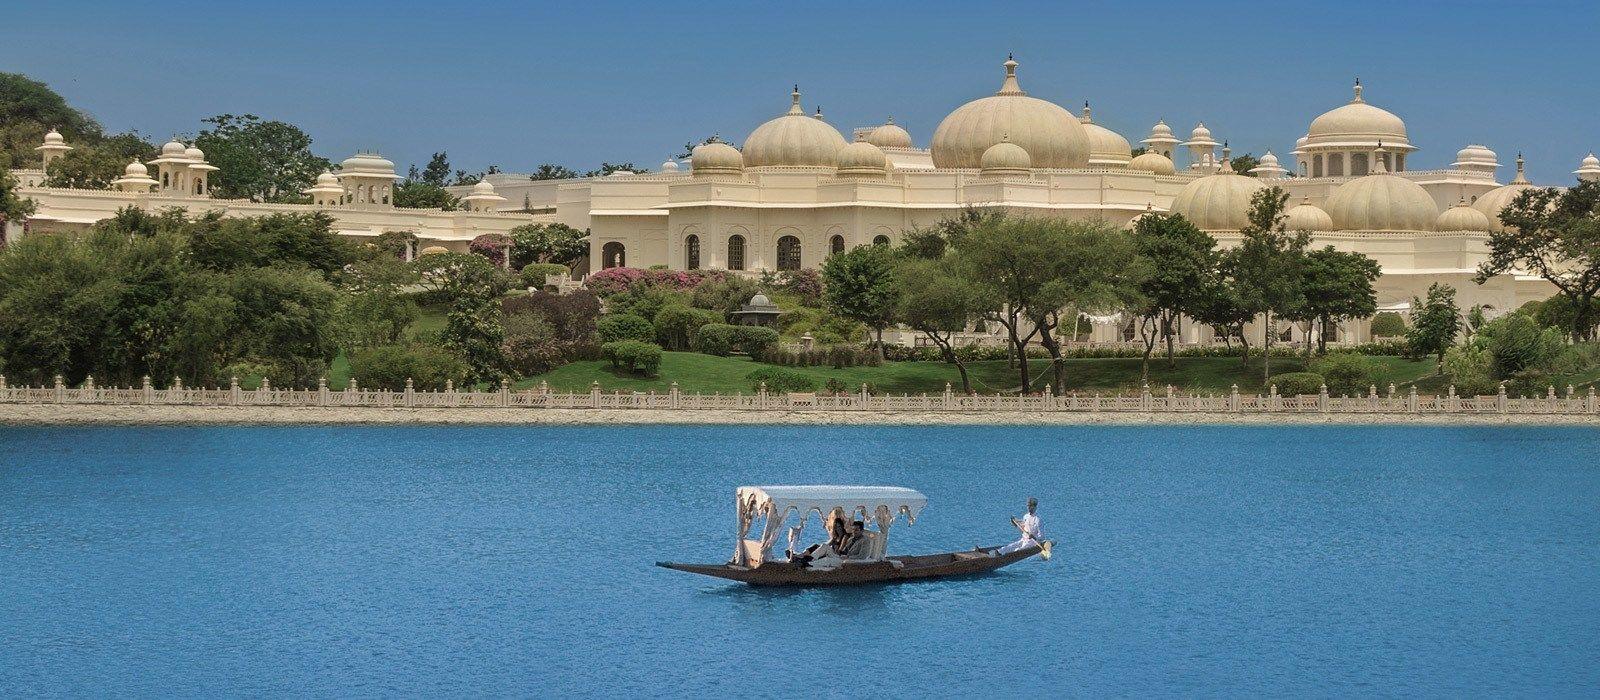 Oberoi Exclusive: Royal Rajasthan and Safari Special Tour Trip 7